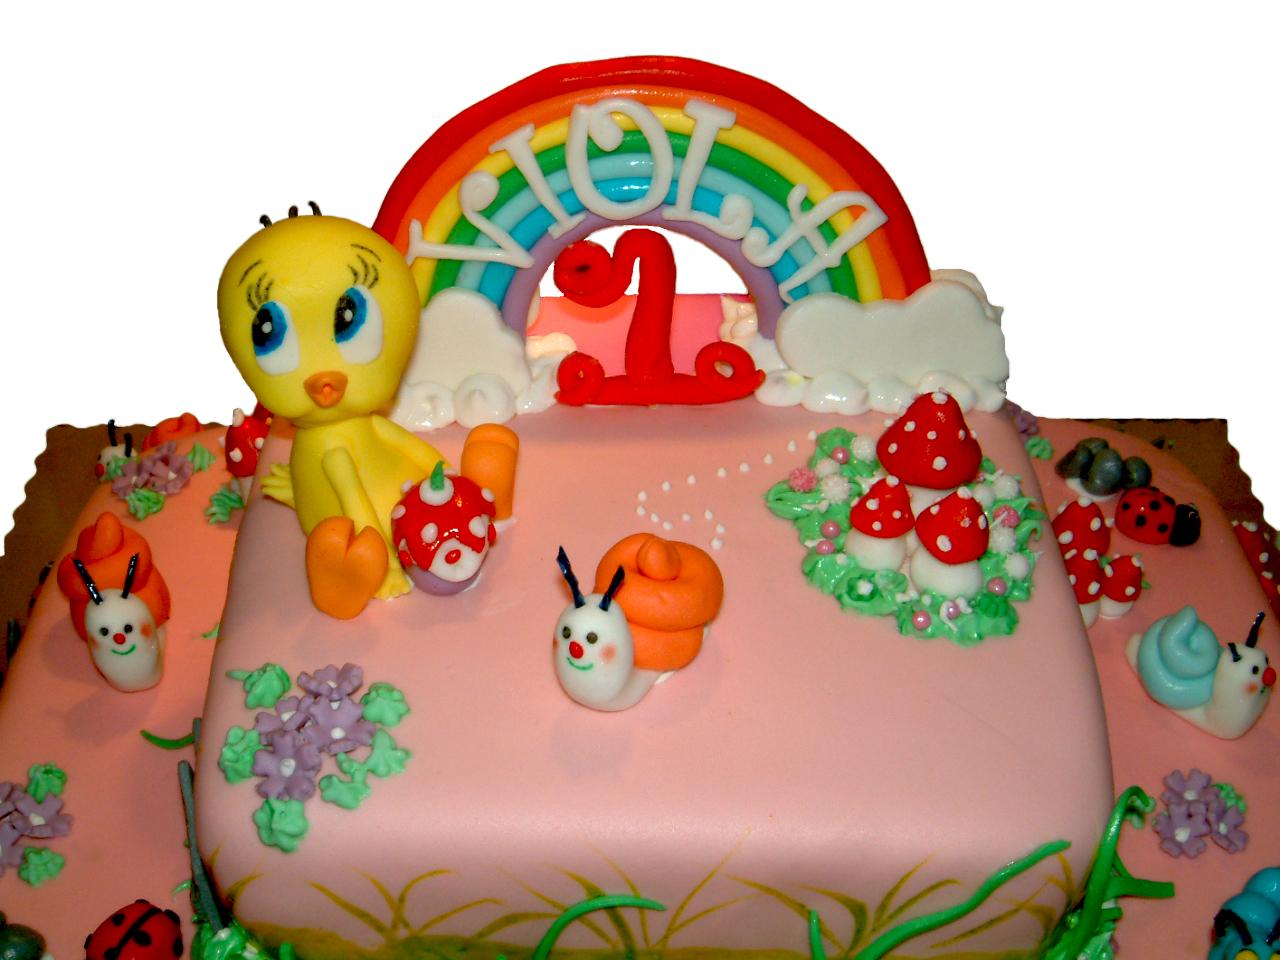 Pin Baci Designer Cake Boss Bridezilla Cake on Pinterest